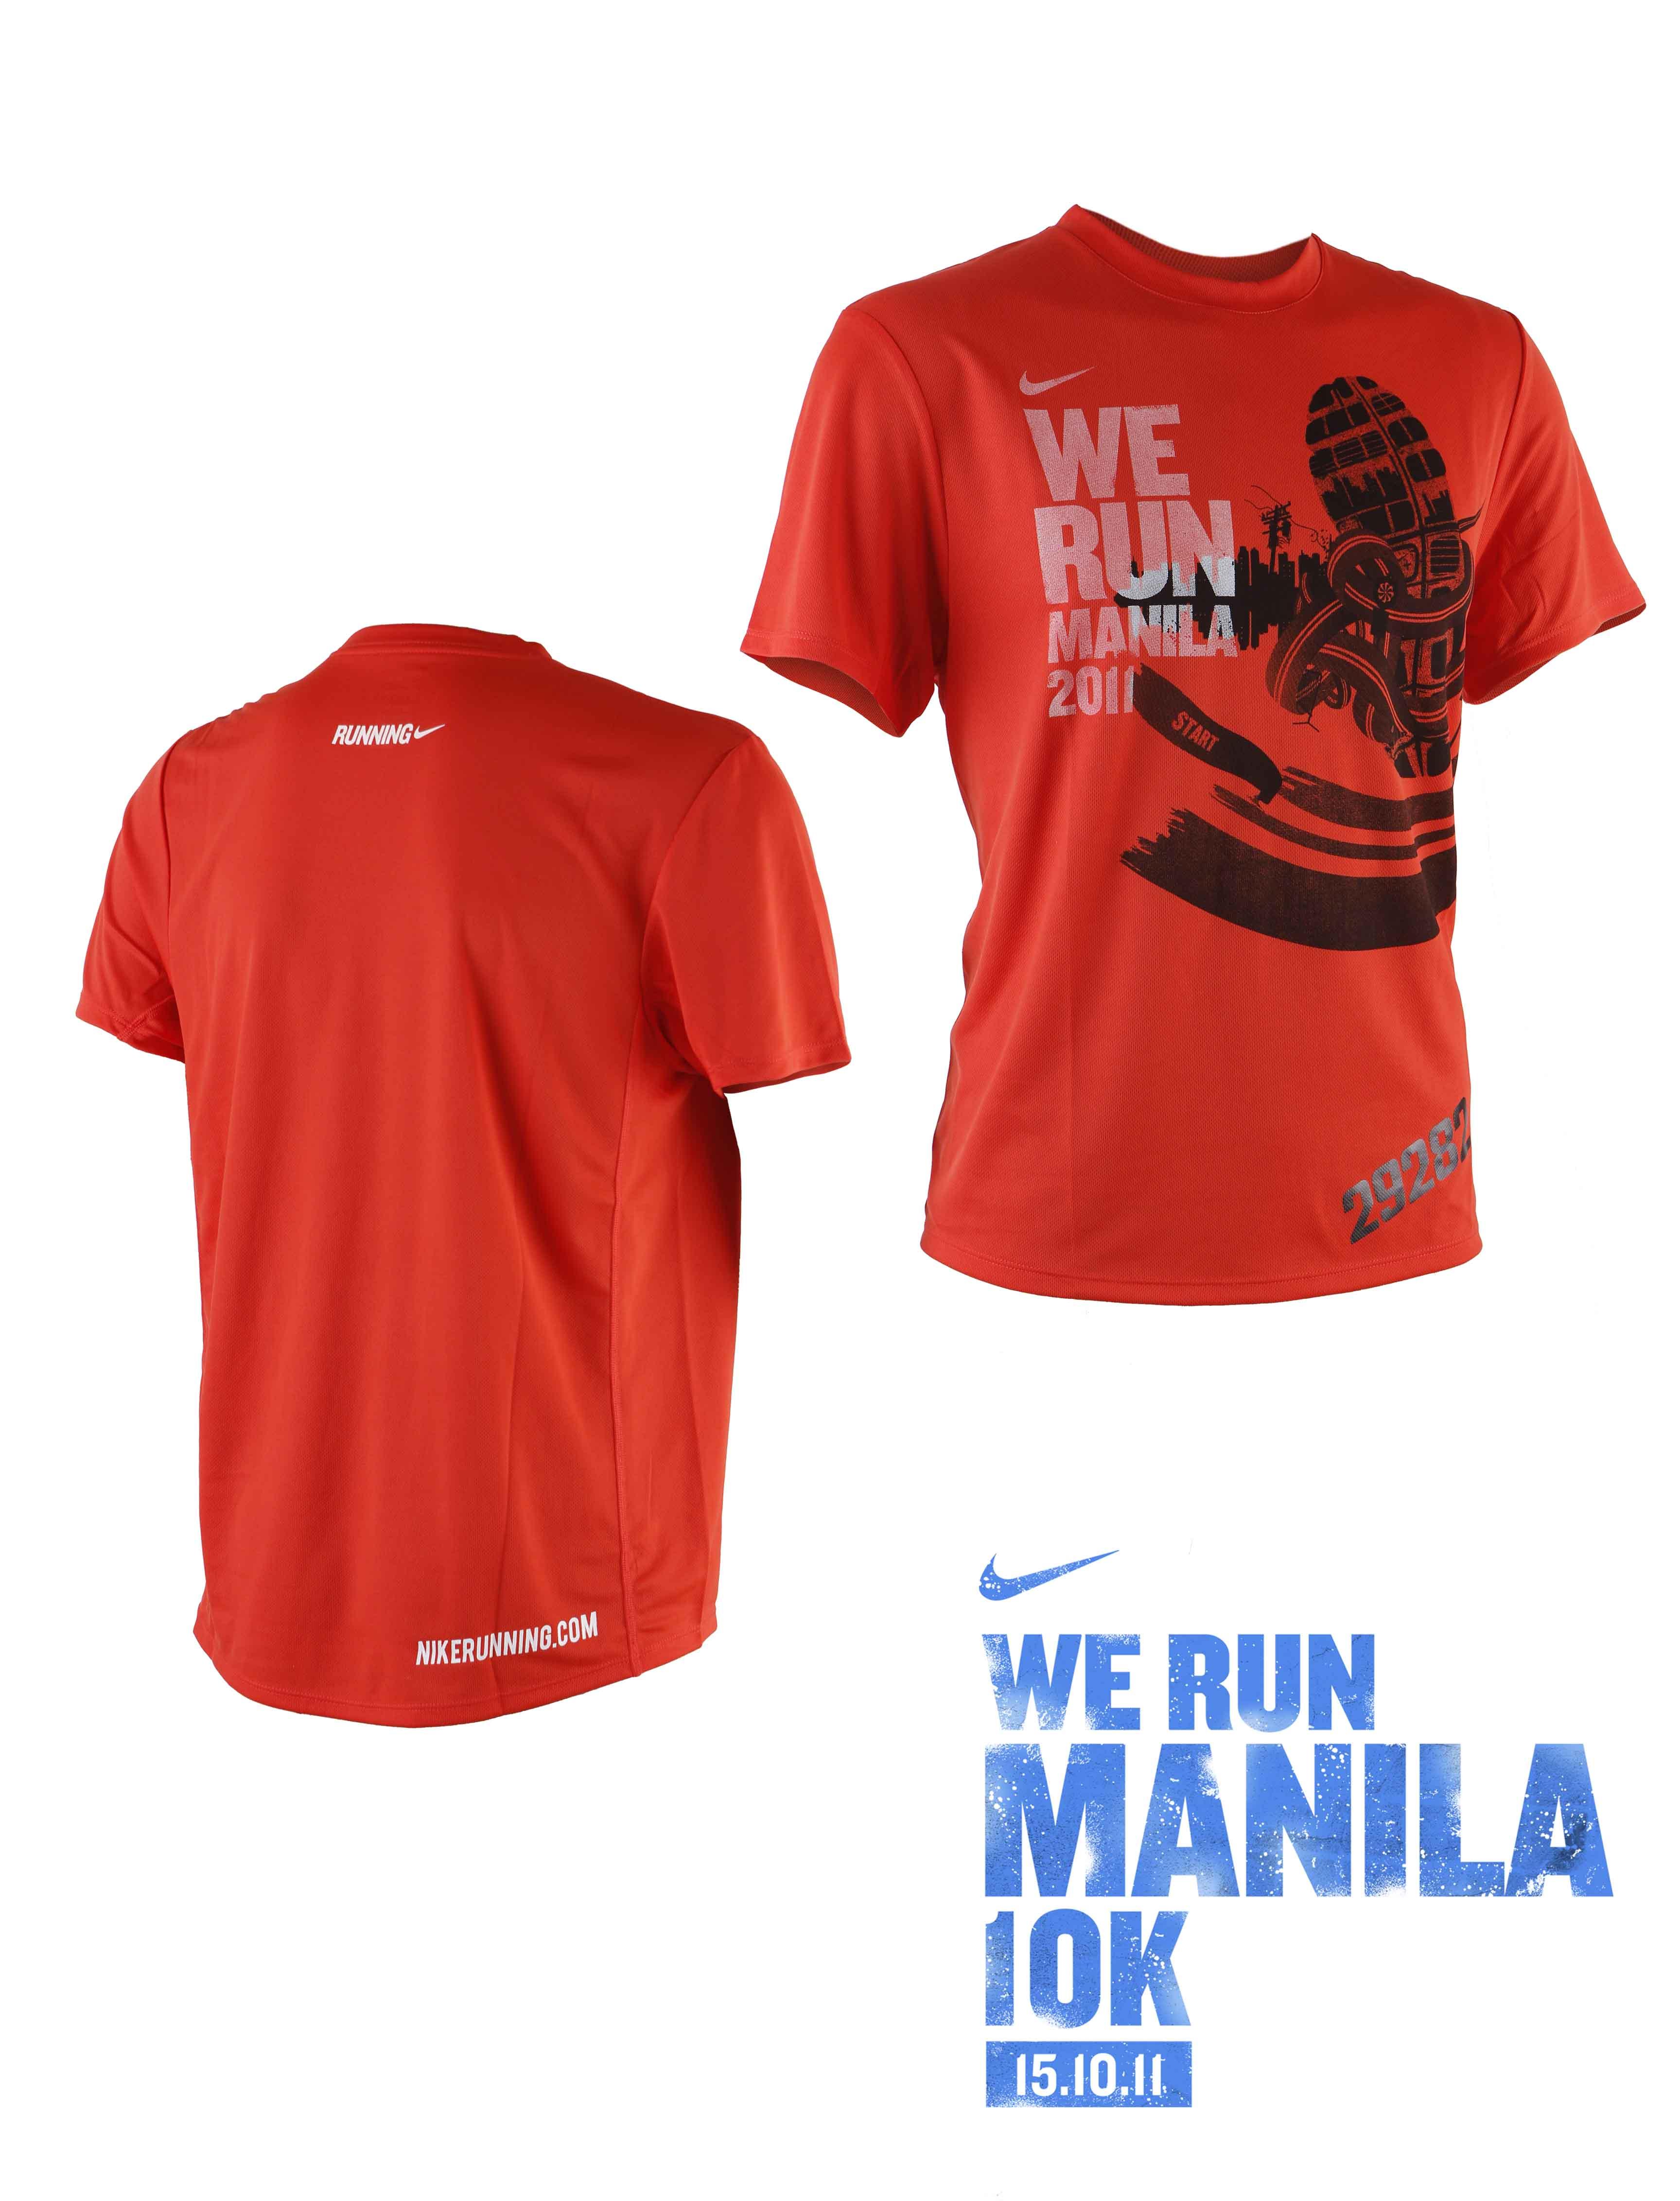 Nike Run Club - Home Facebook Nike we run manila photos